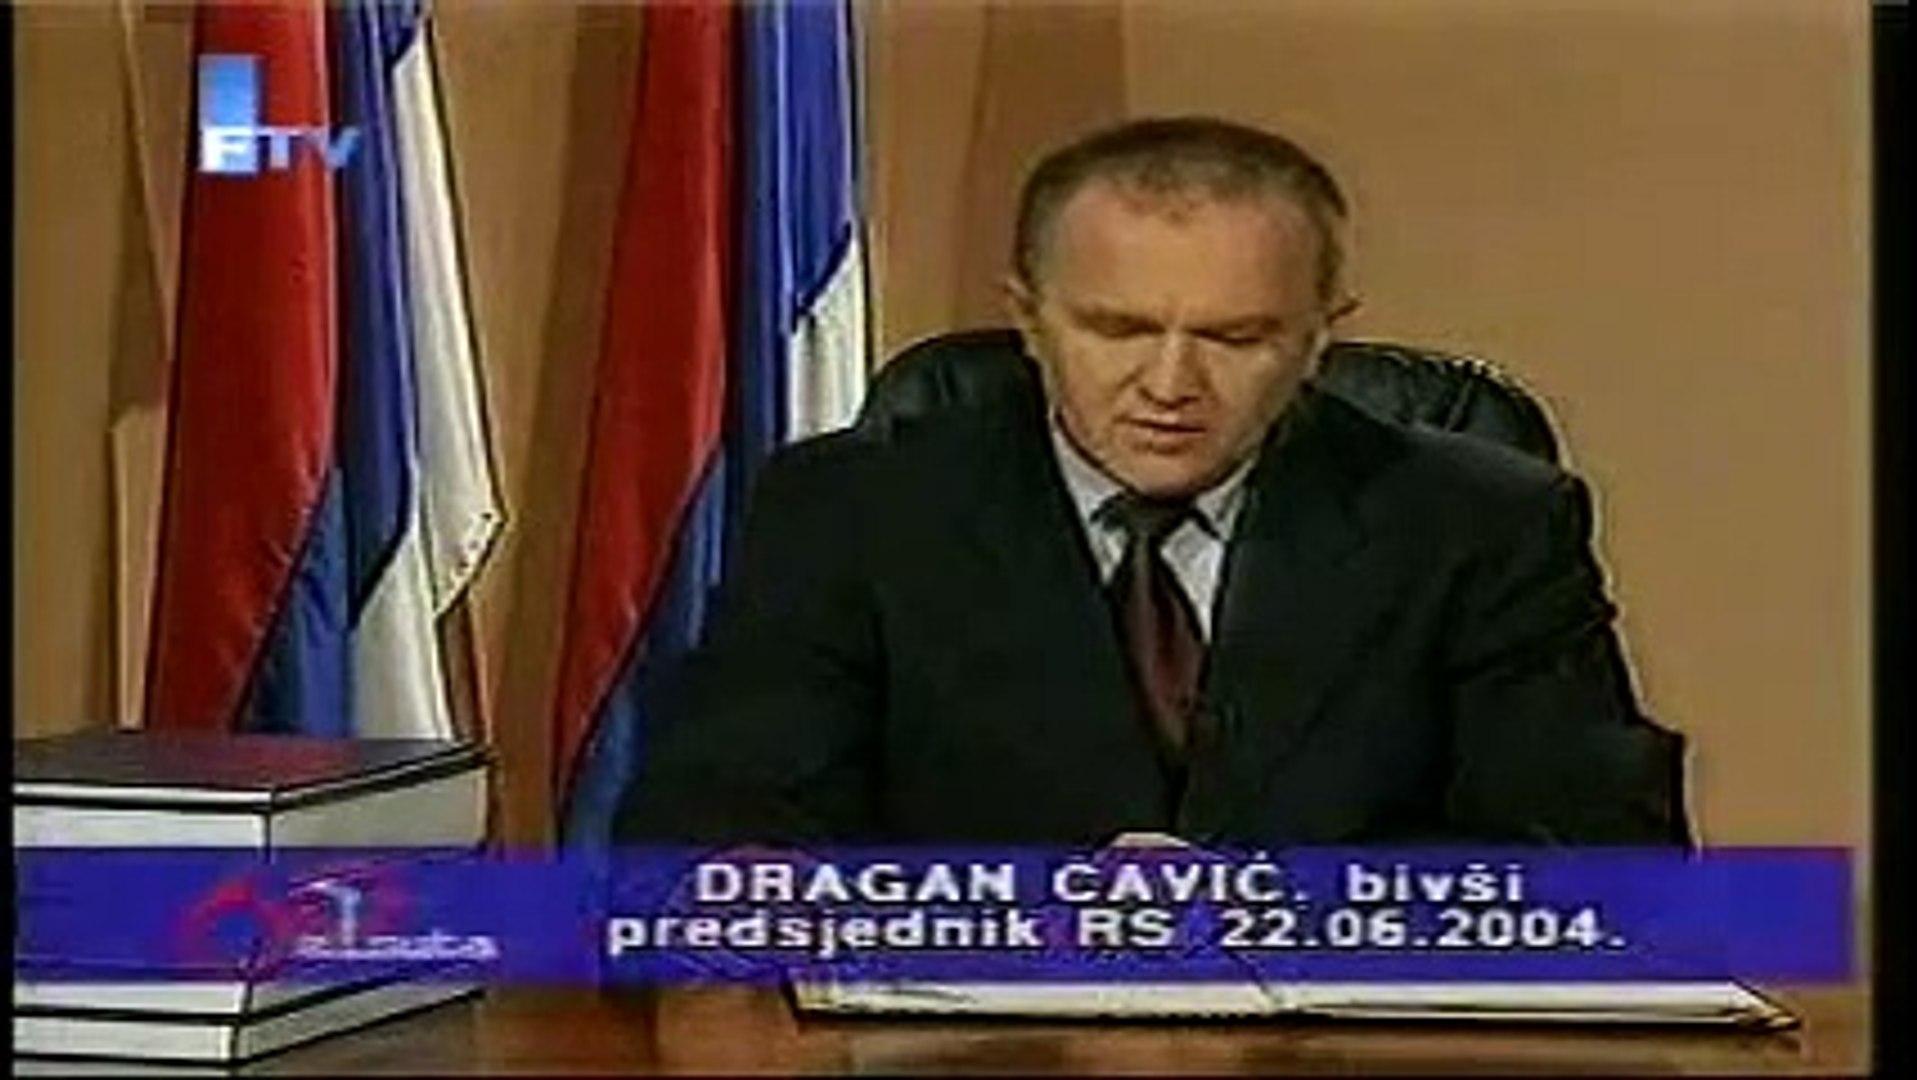 Dragan Čavič - predsjednik RS